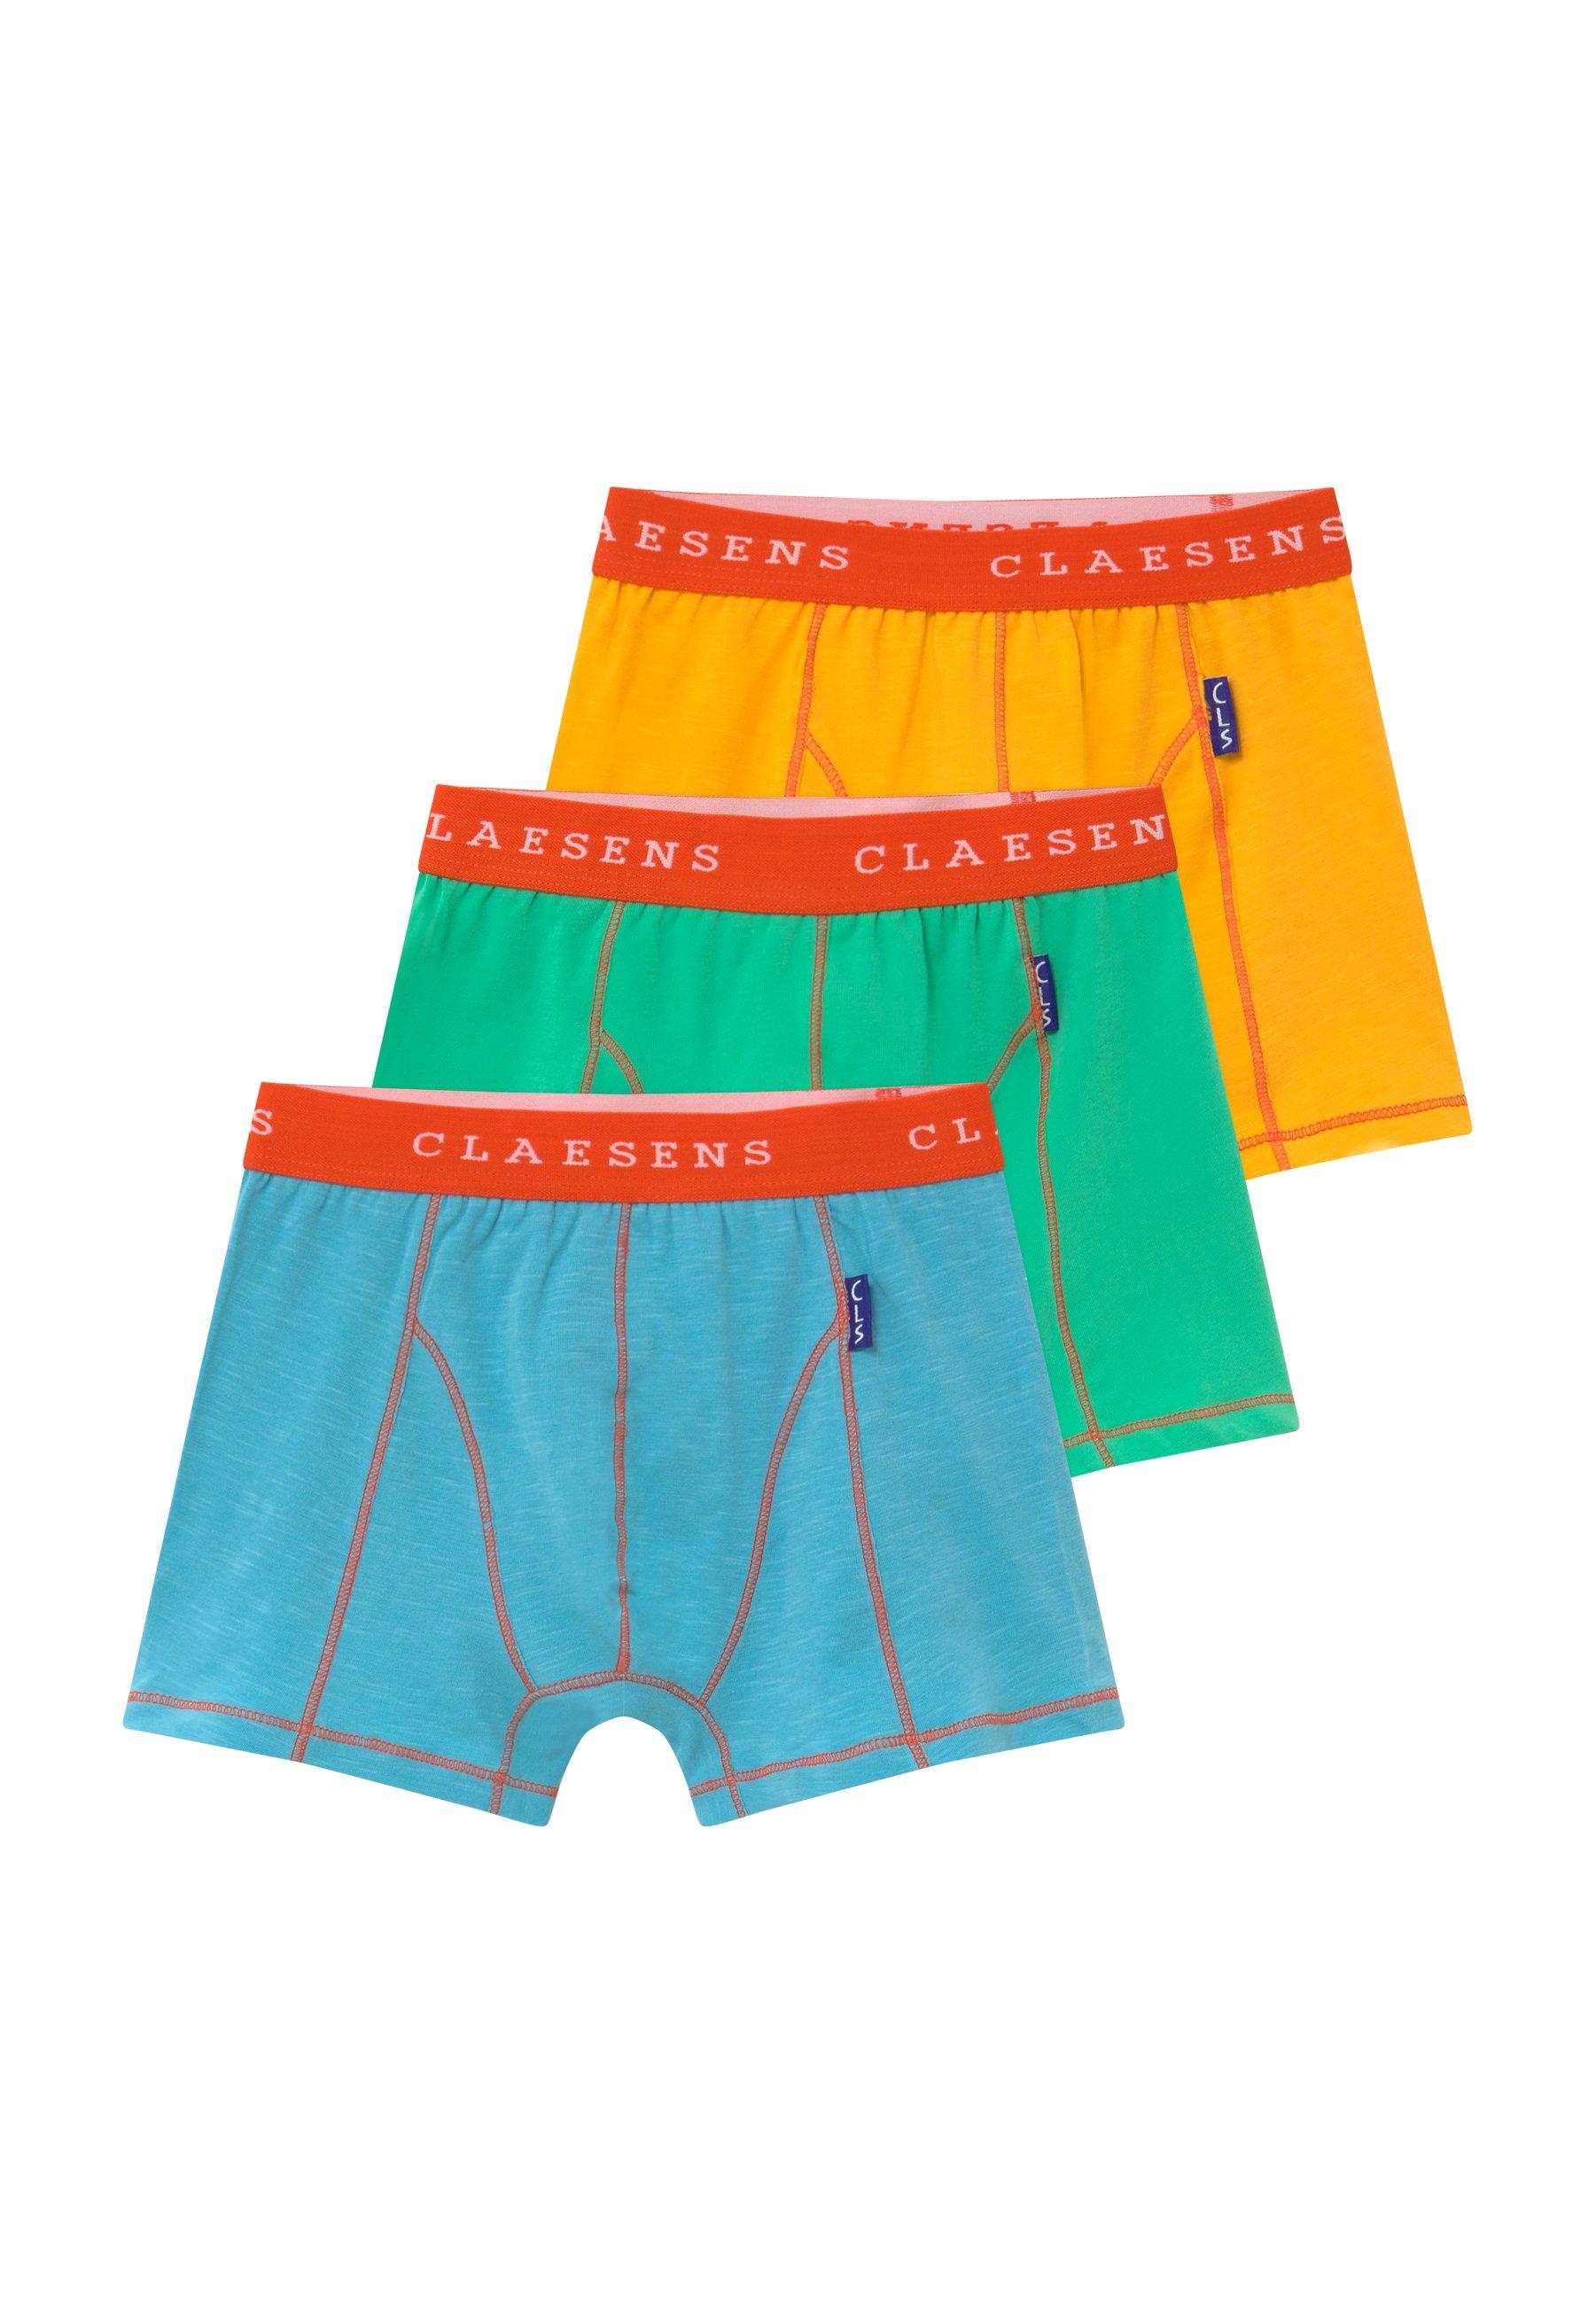 Claesen's Boys Boxer 3 Pack - Pants Blue/green/orange